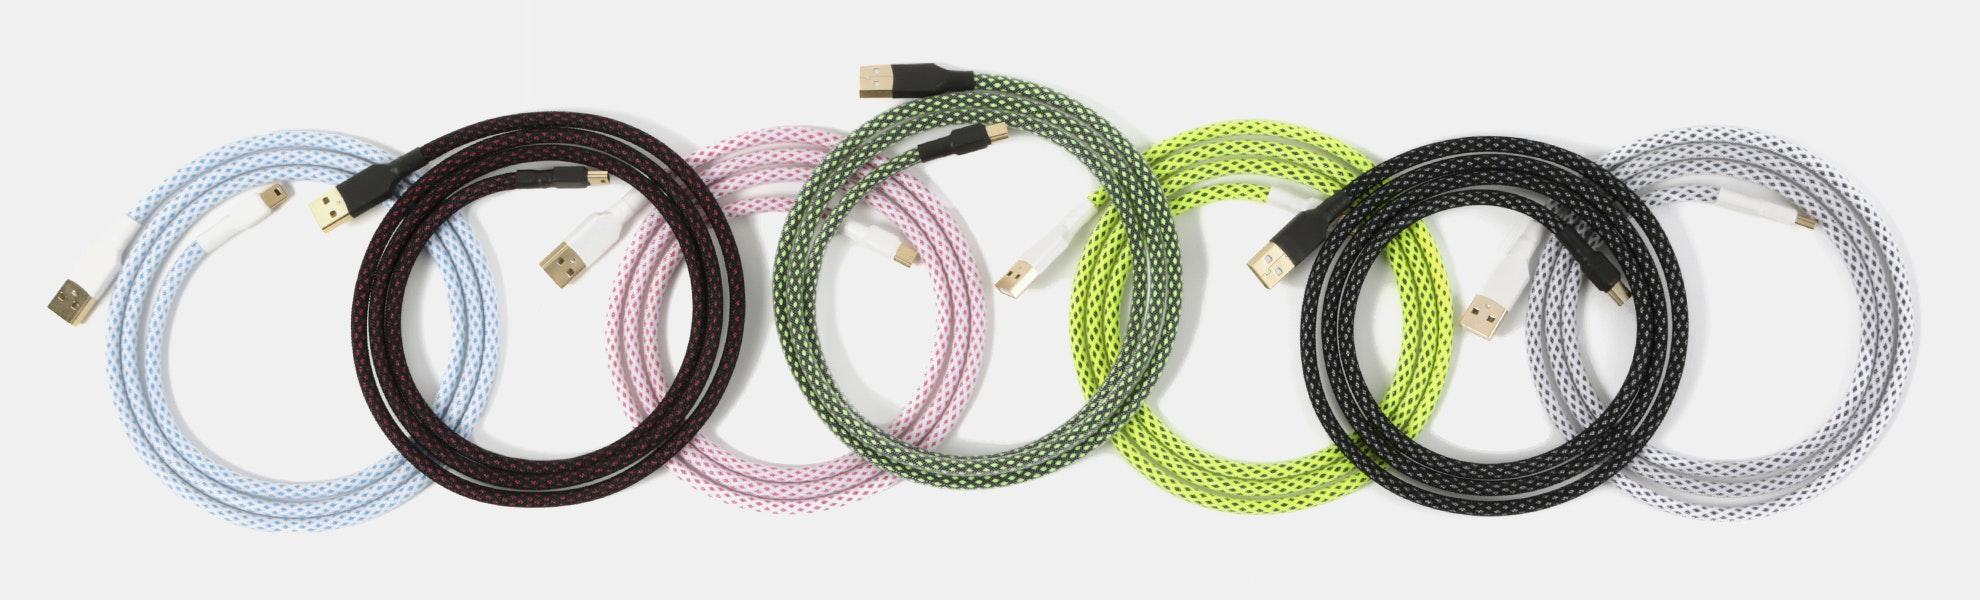 Diamond-Patterned Techflex USB Cables